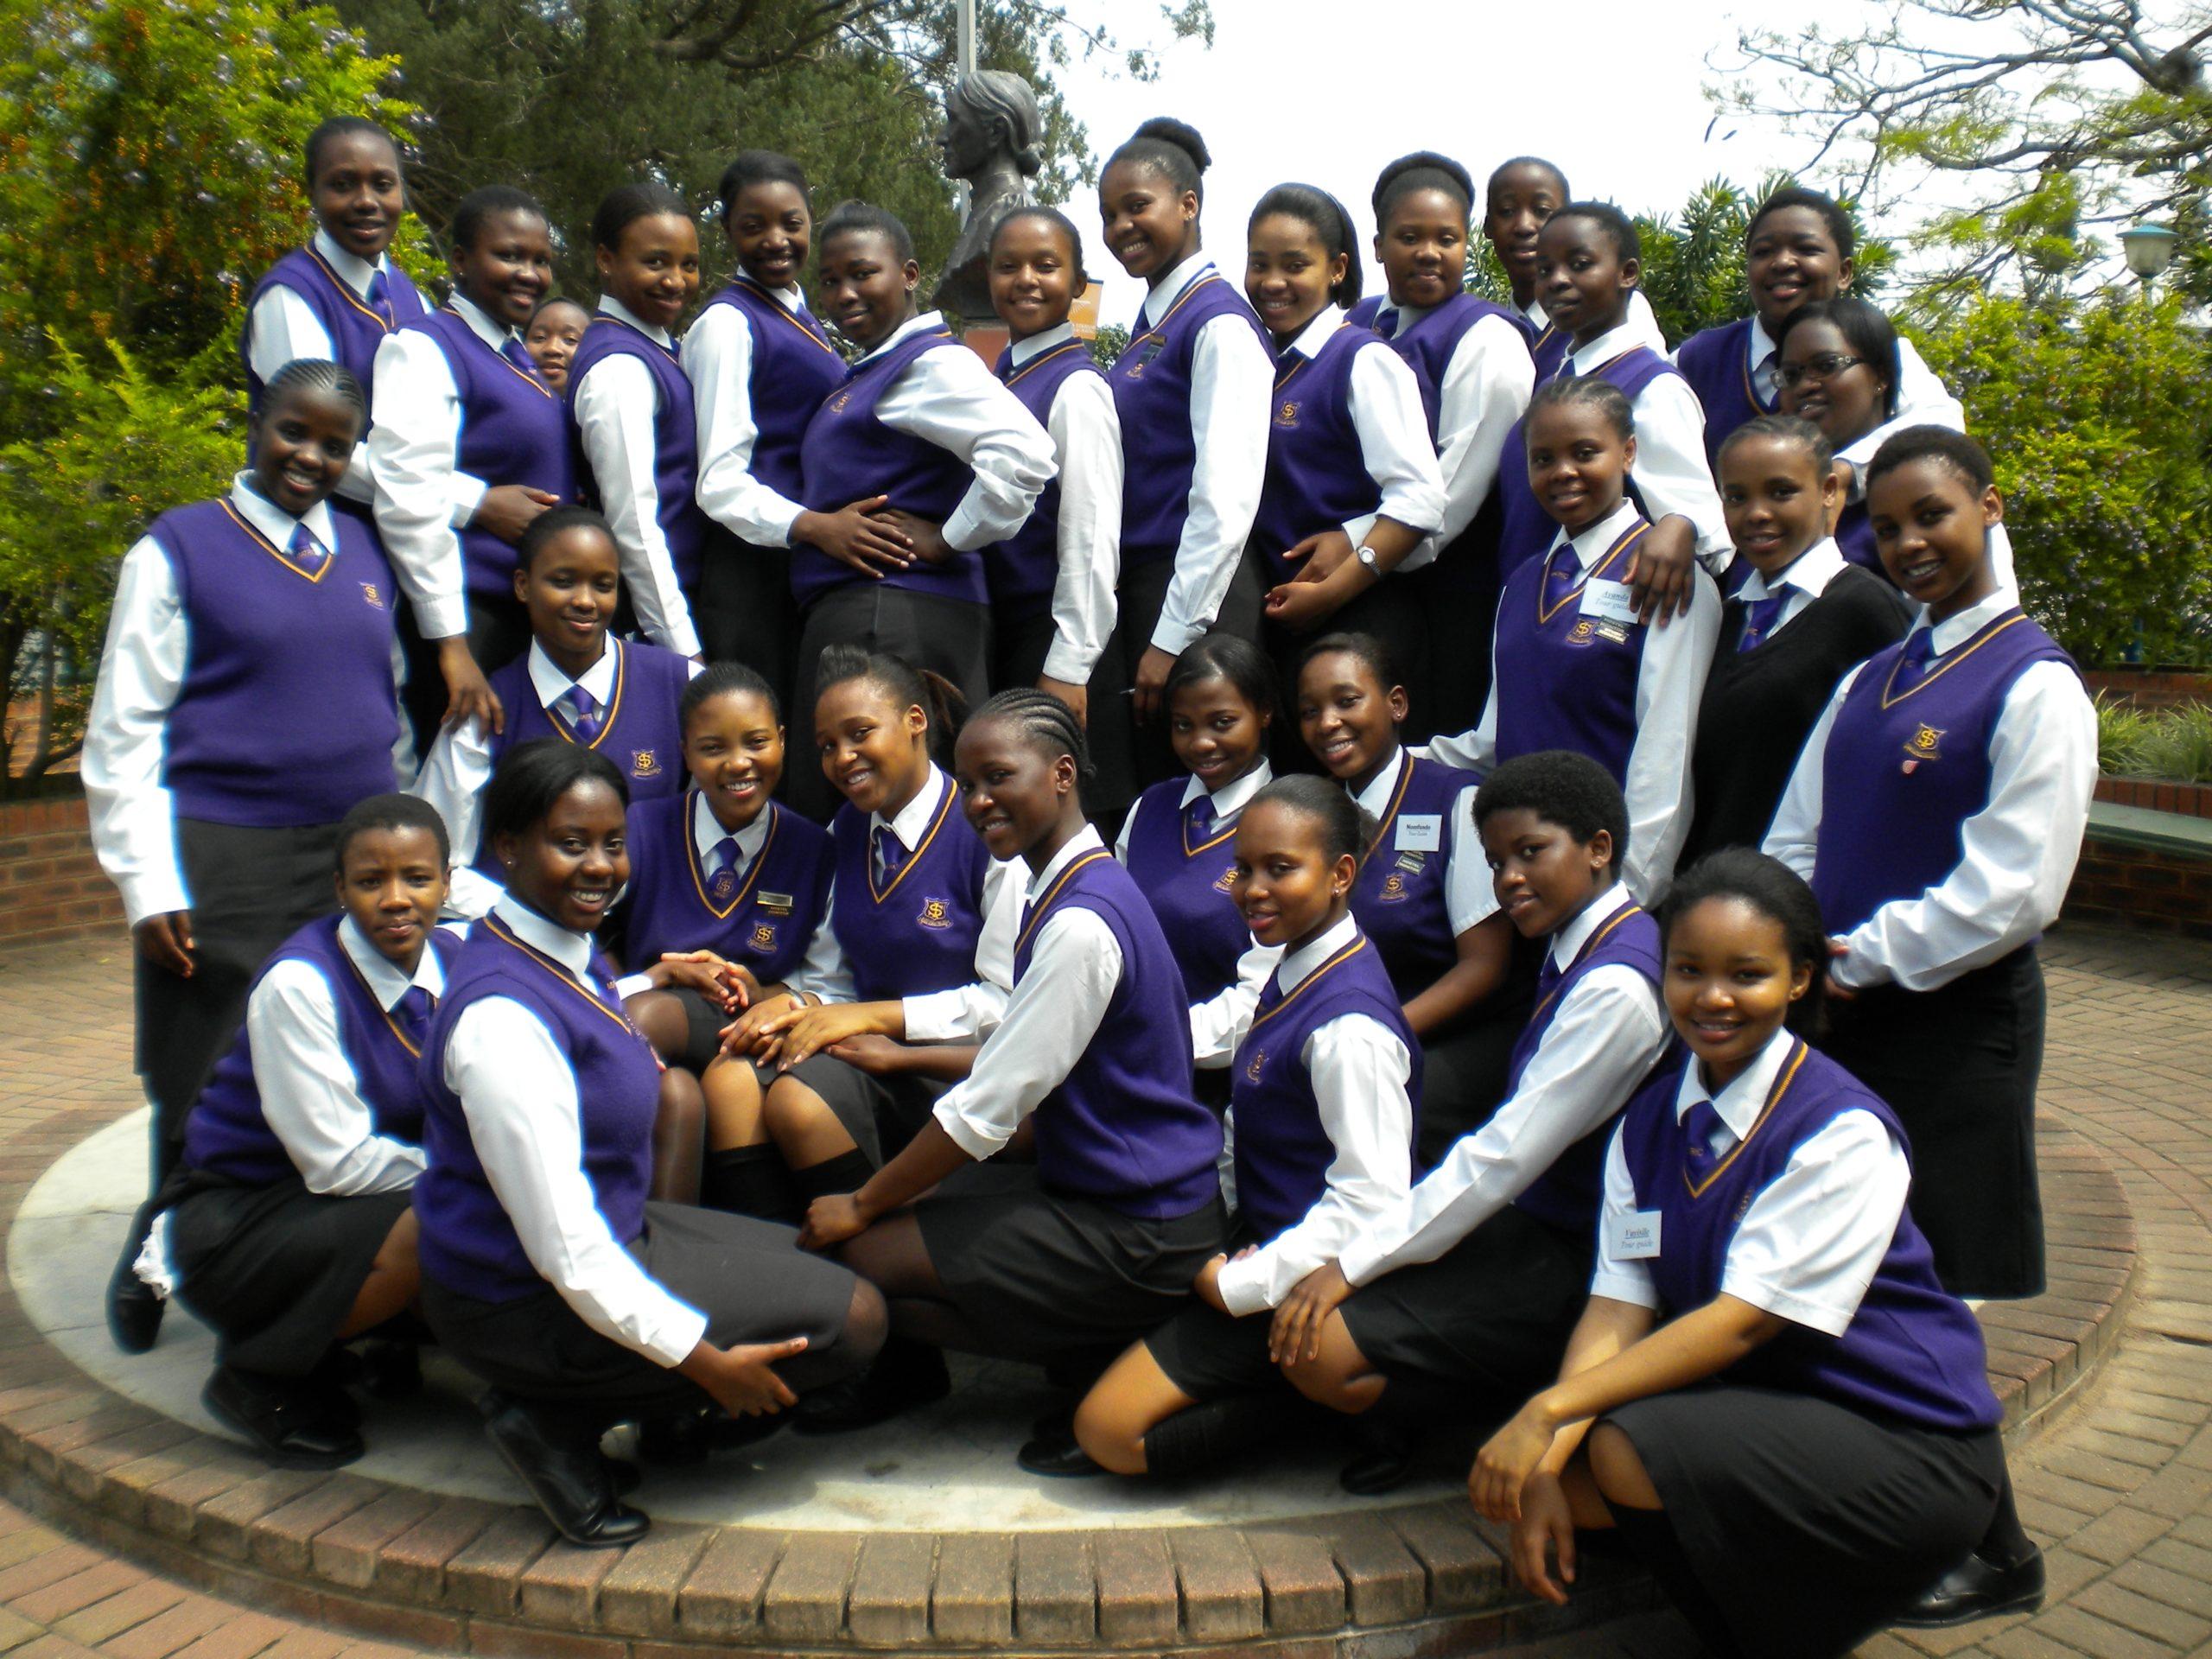 Inanda_Seminary_Seniors_2010.JPG